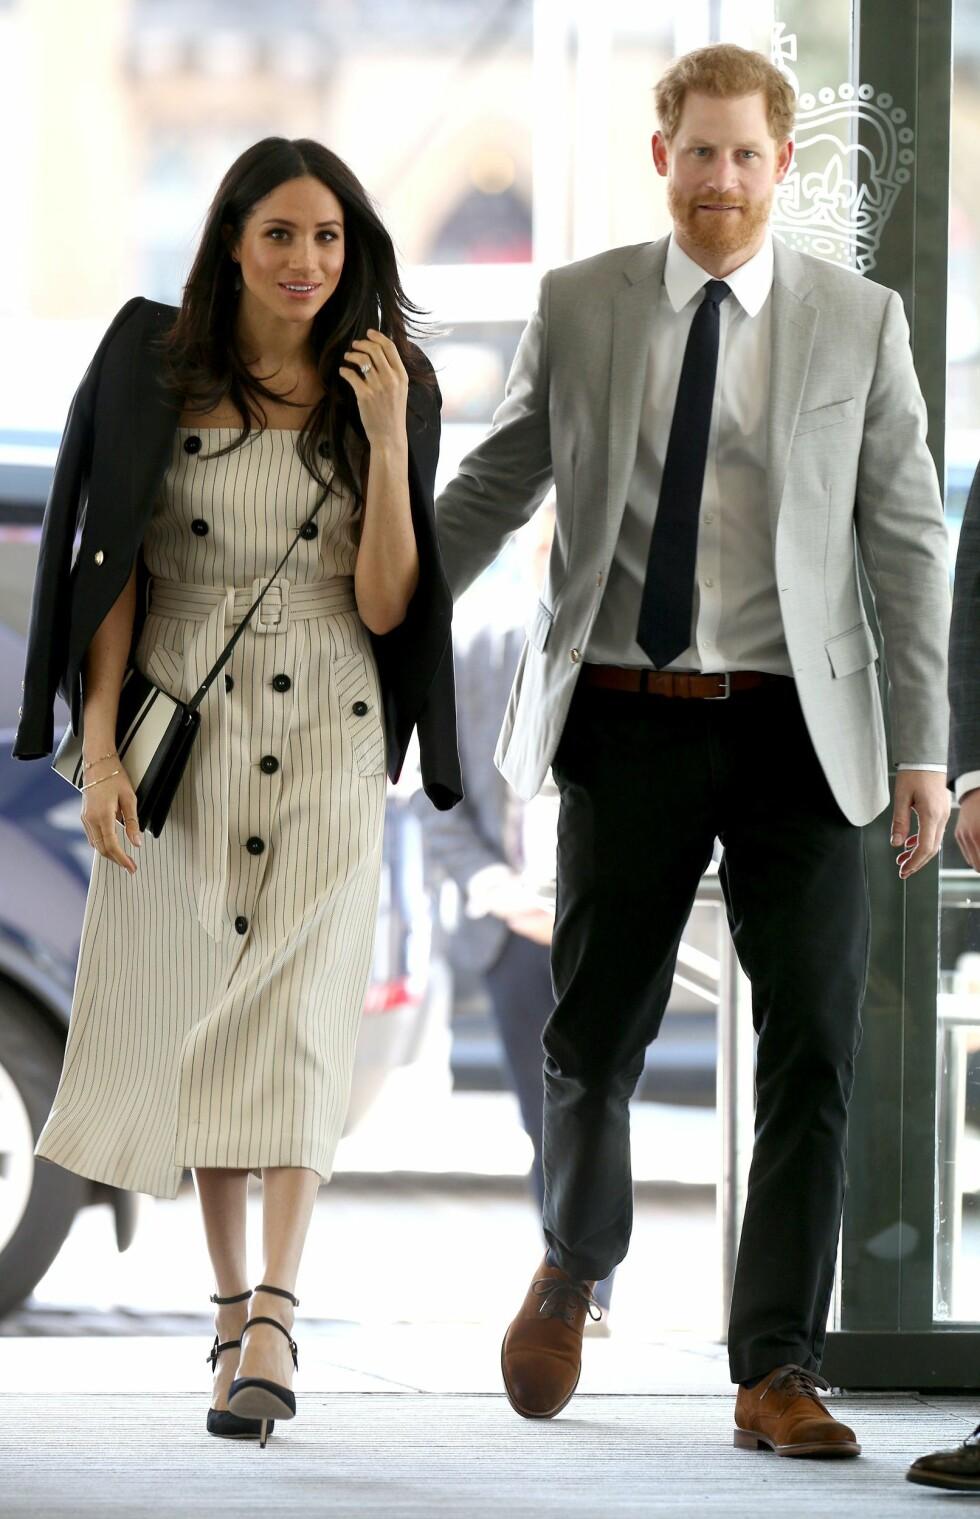 <strong>STØTTER FORLOVEDEN:</strong> Prins Harry og Meghan Markle fotografert samme dag som hennes halvsøster kom med krass kritikk om paret på sosiale medier. FOTO: NTB Scanpix